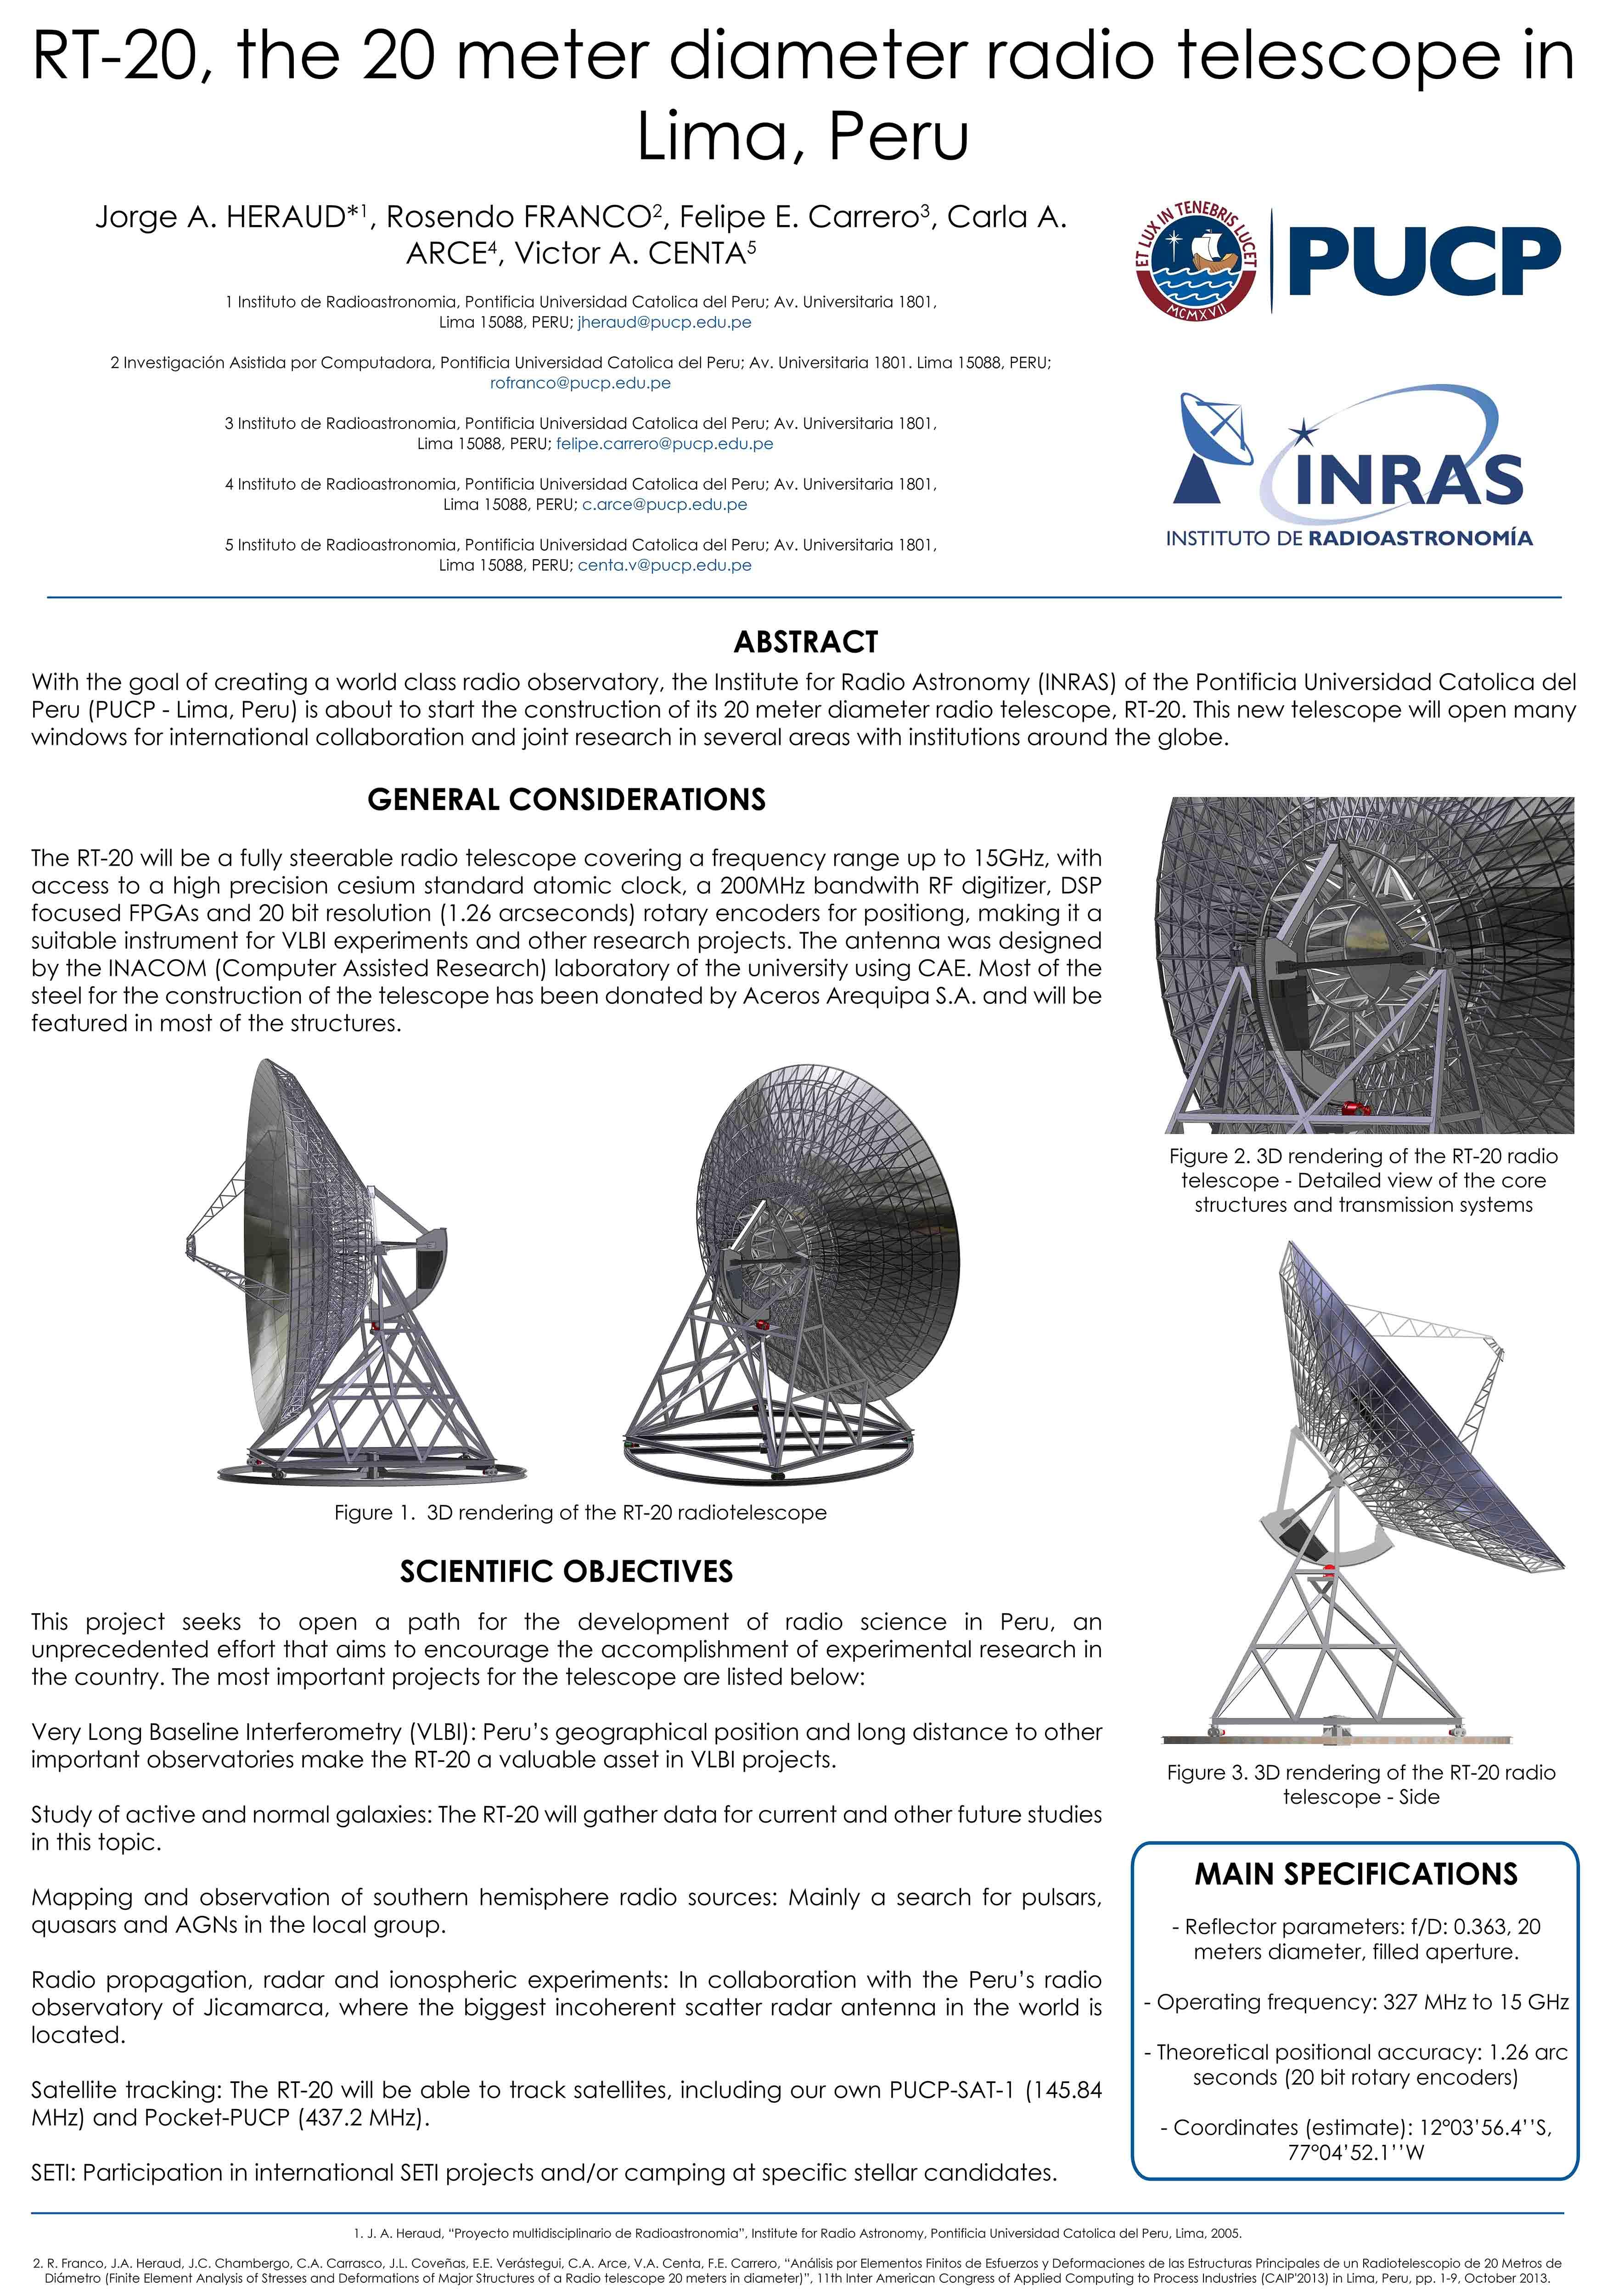 Poster URSI - RT-20